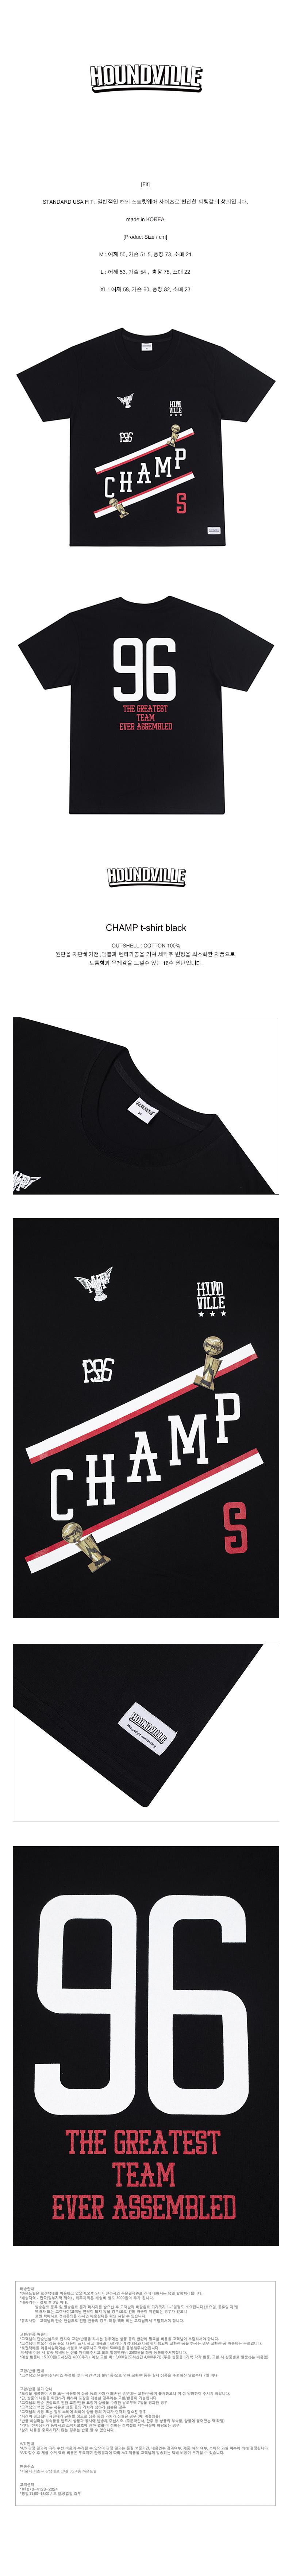 CHAMP t-shirt black.jpg